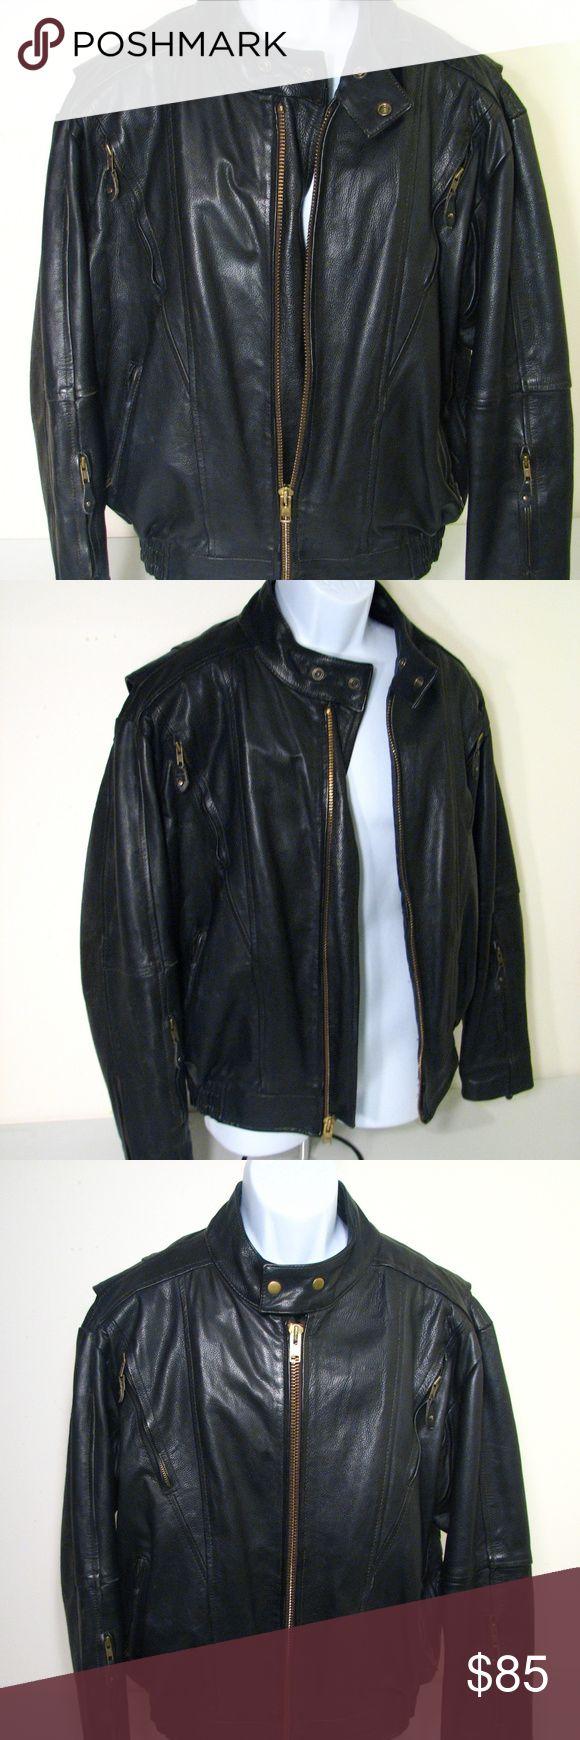 Black Leather Motercycle Jacket Heavy Duty Black Leather